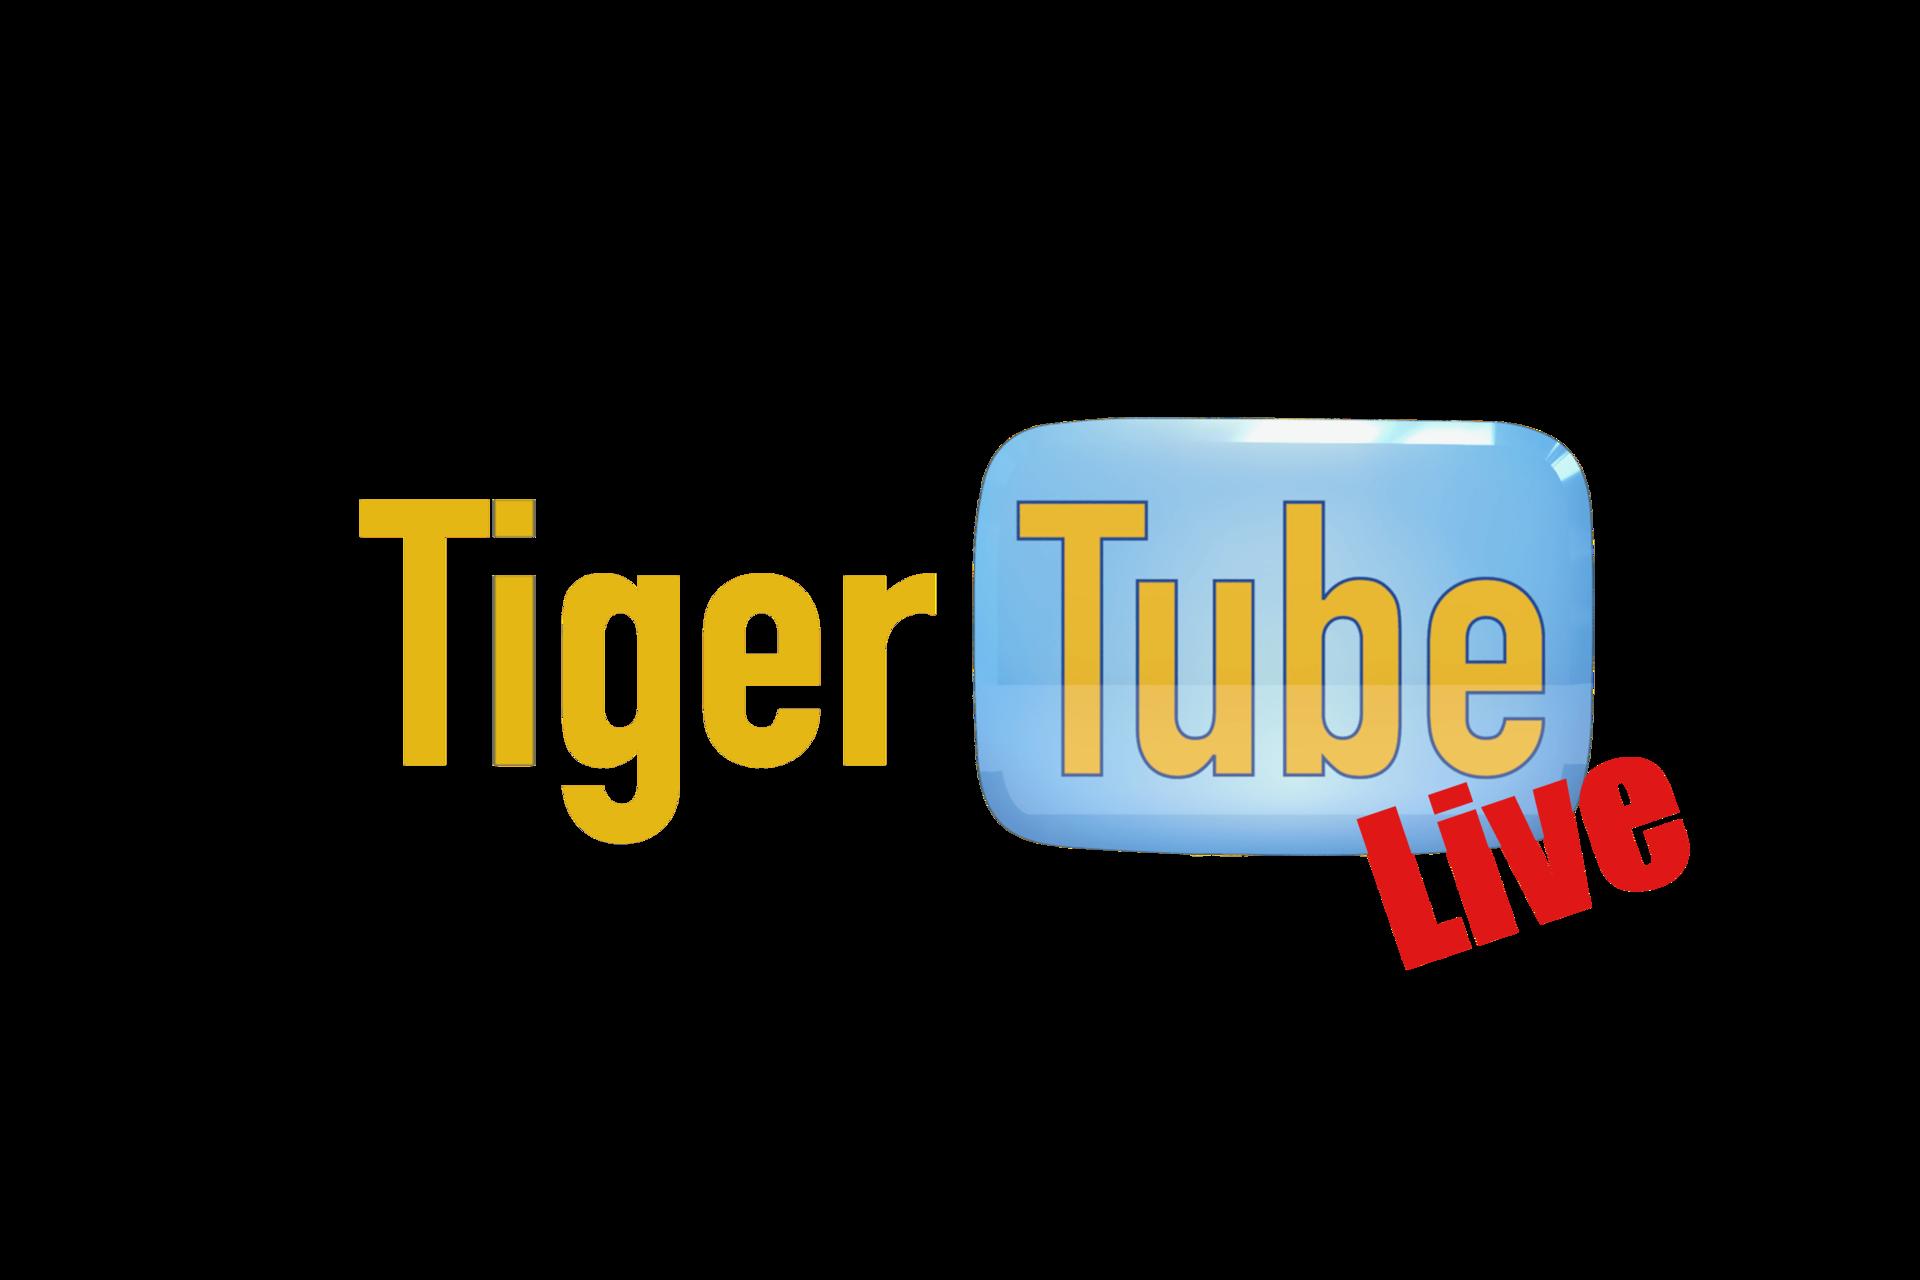 Tiger Tube Live